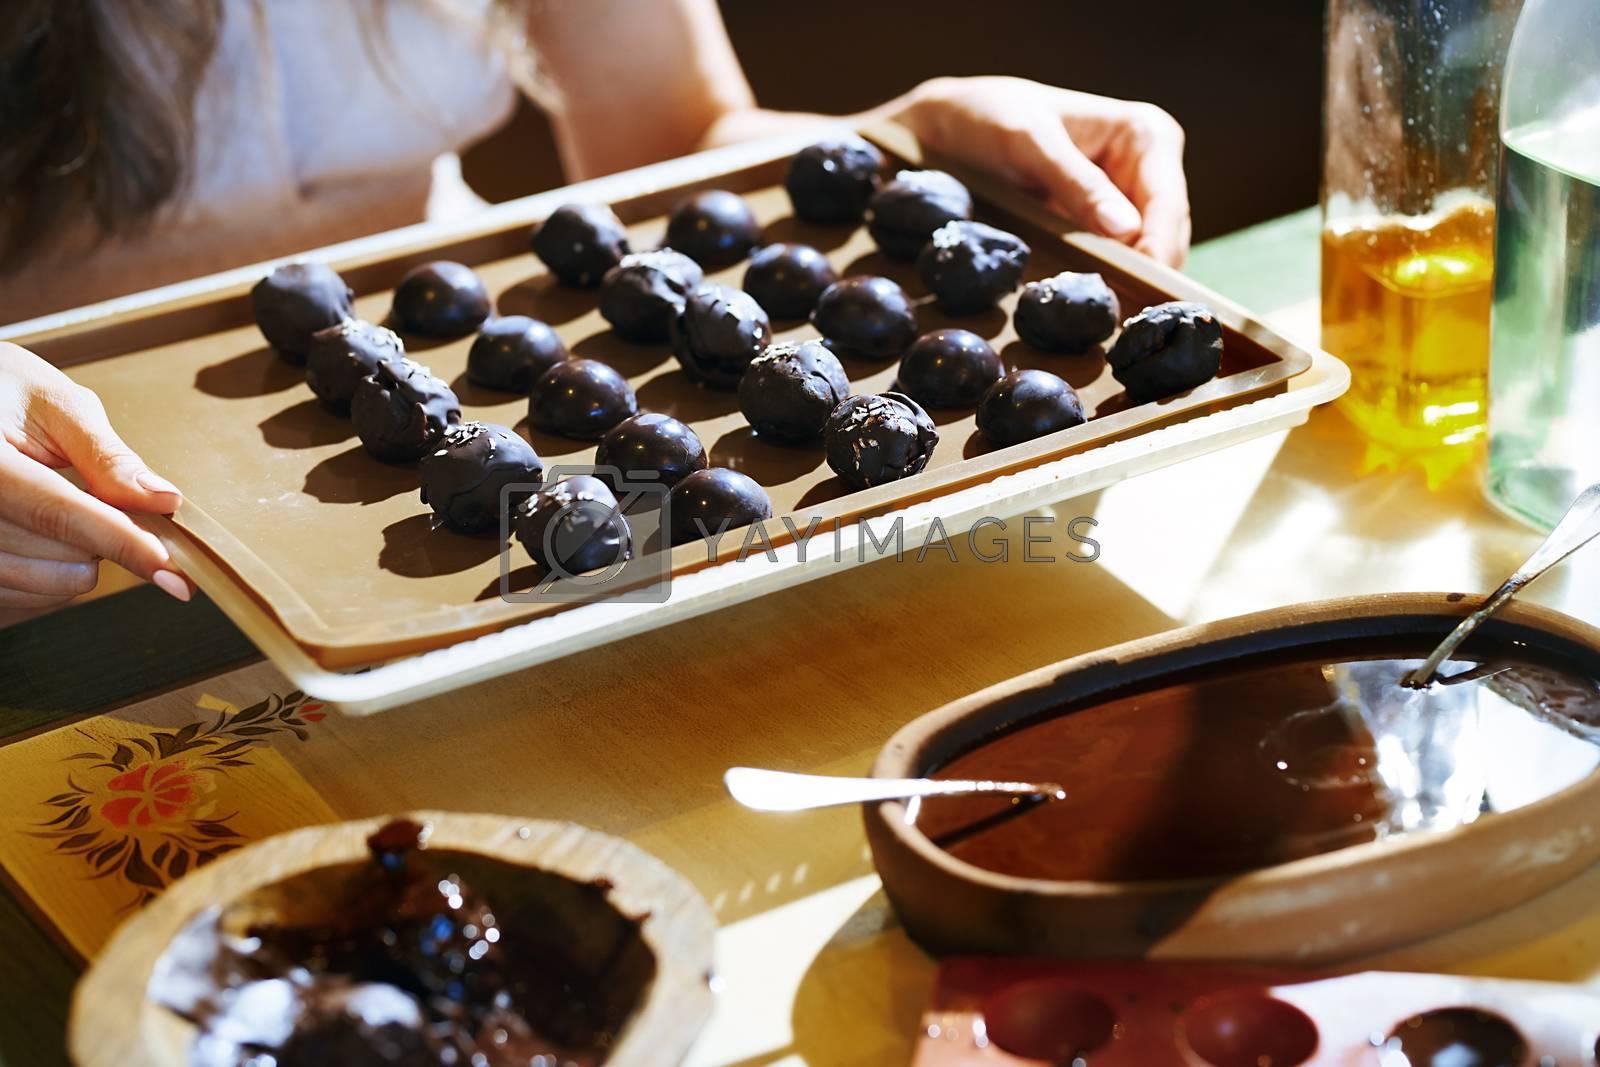 Staying at home woman preparing handmade vegetarian chocolate tr by Novic